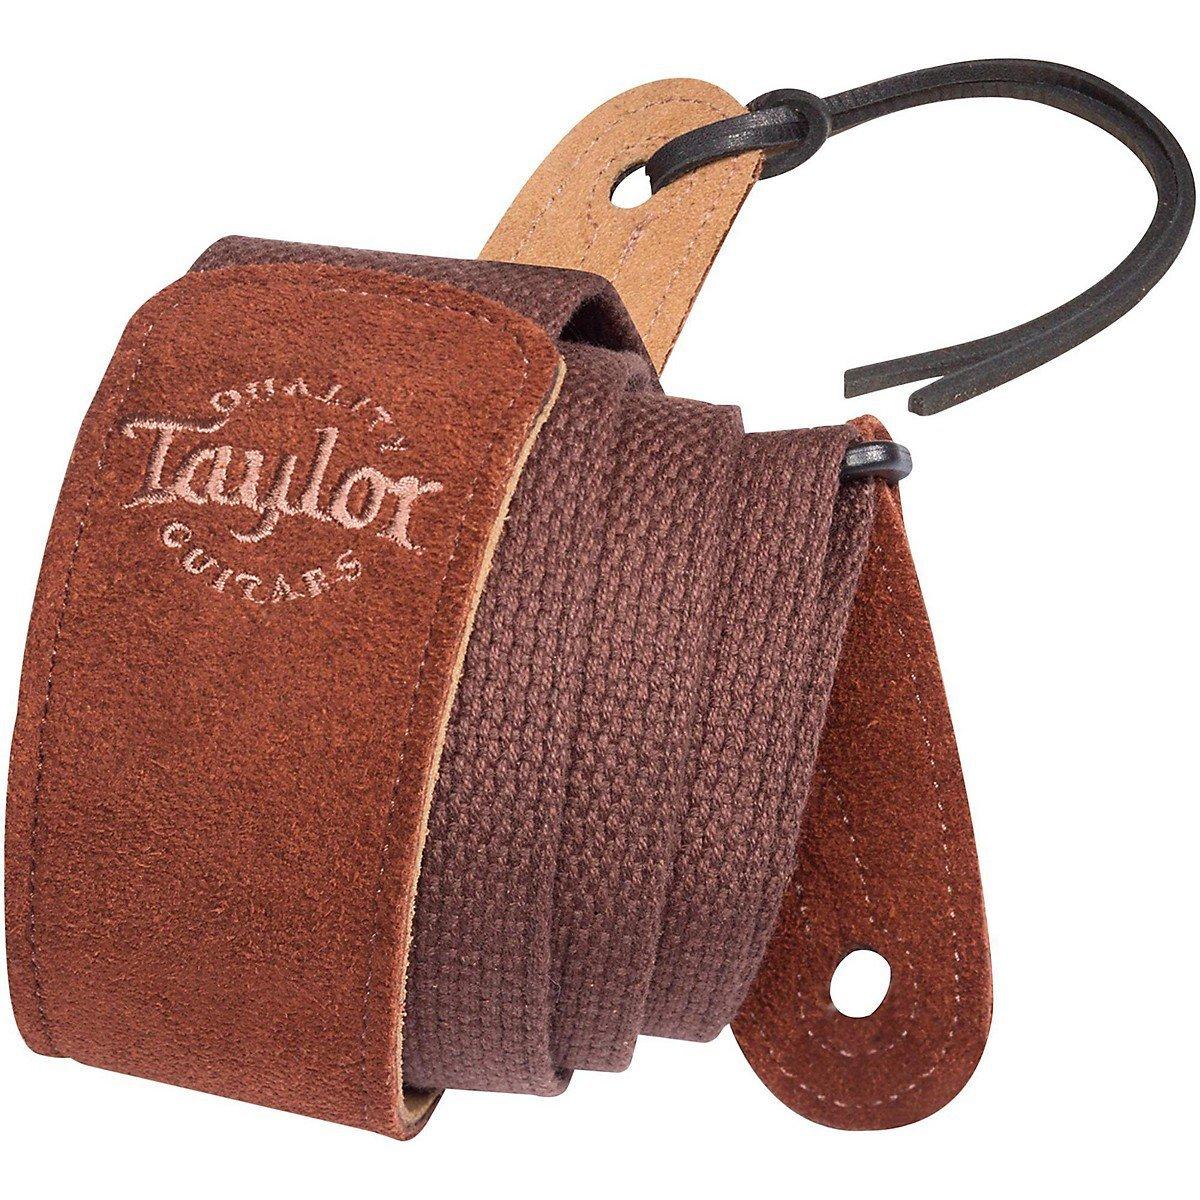 Taylor Suede/Web Strap Chocolate